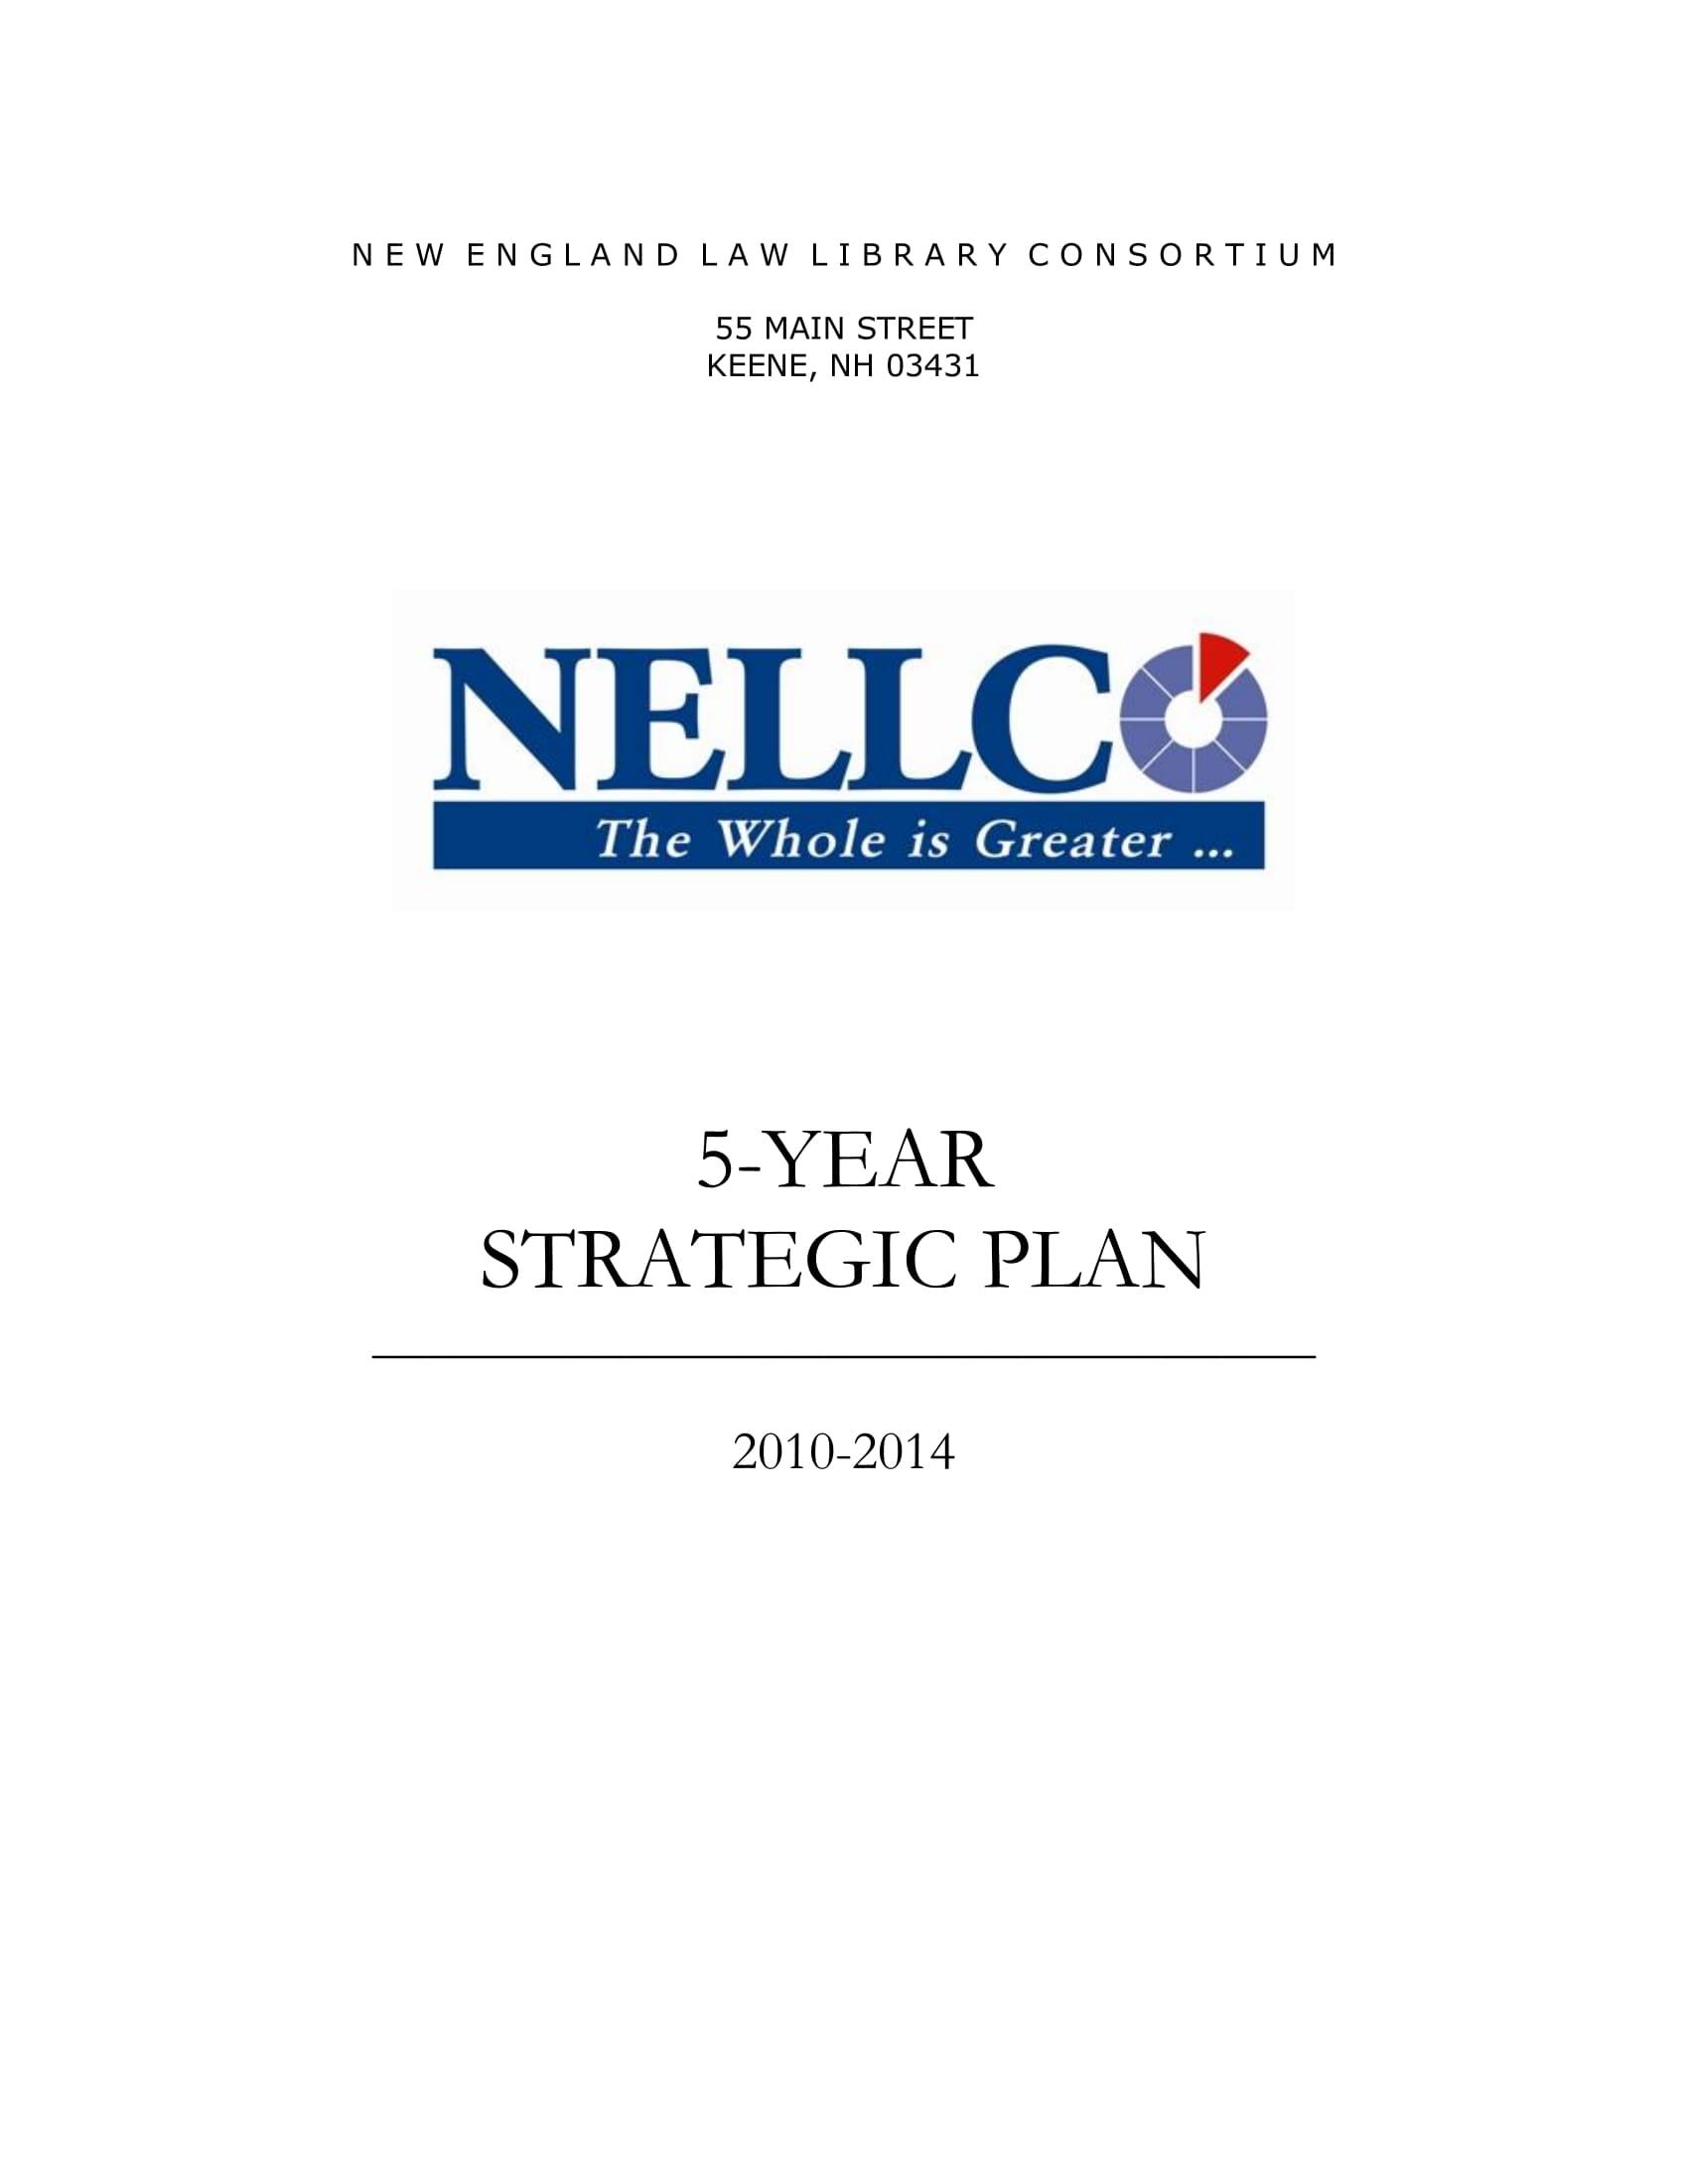 10 5 Year Strategic Plan Examples